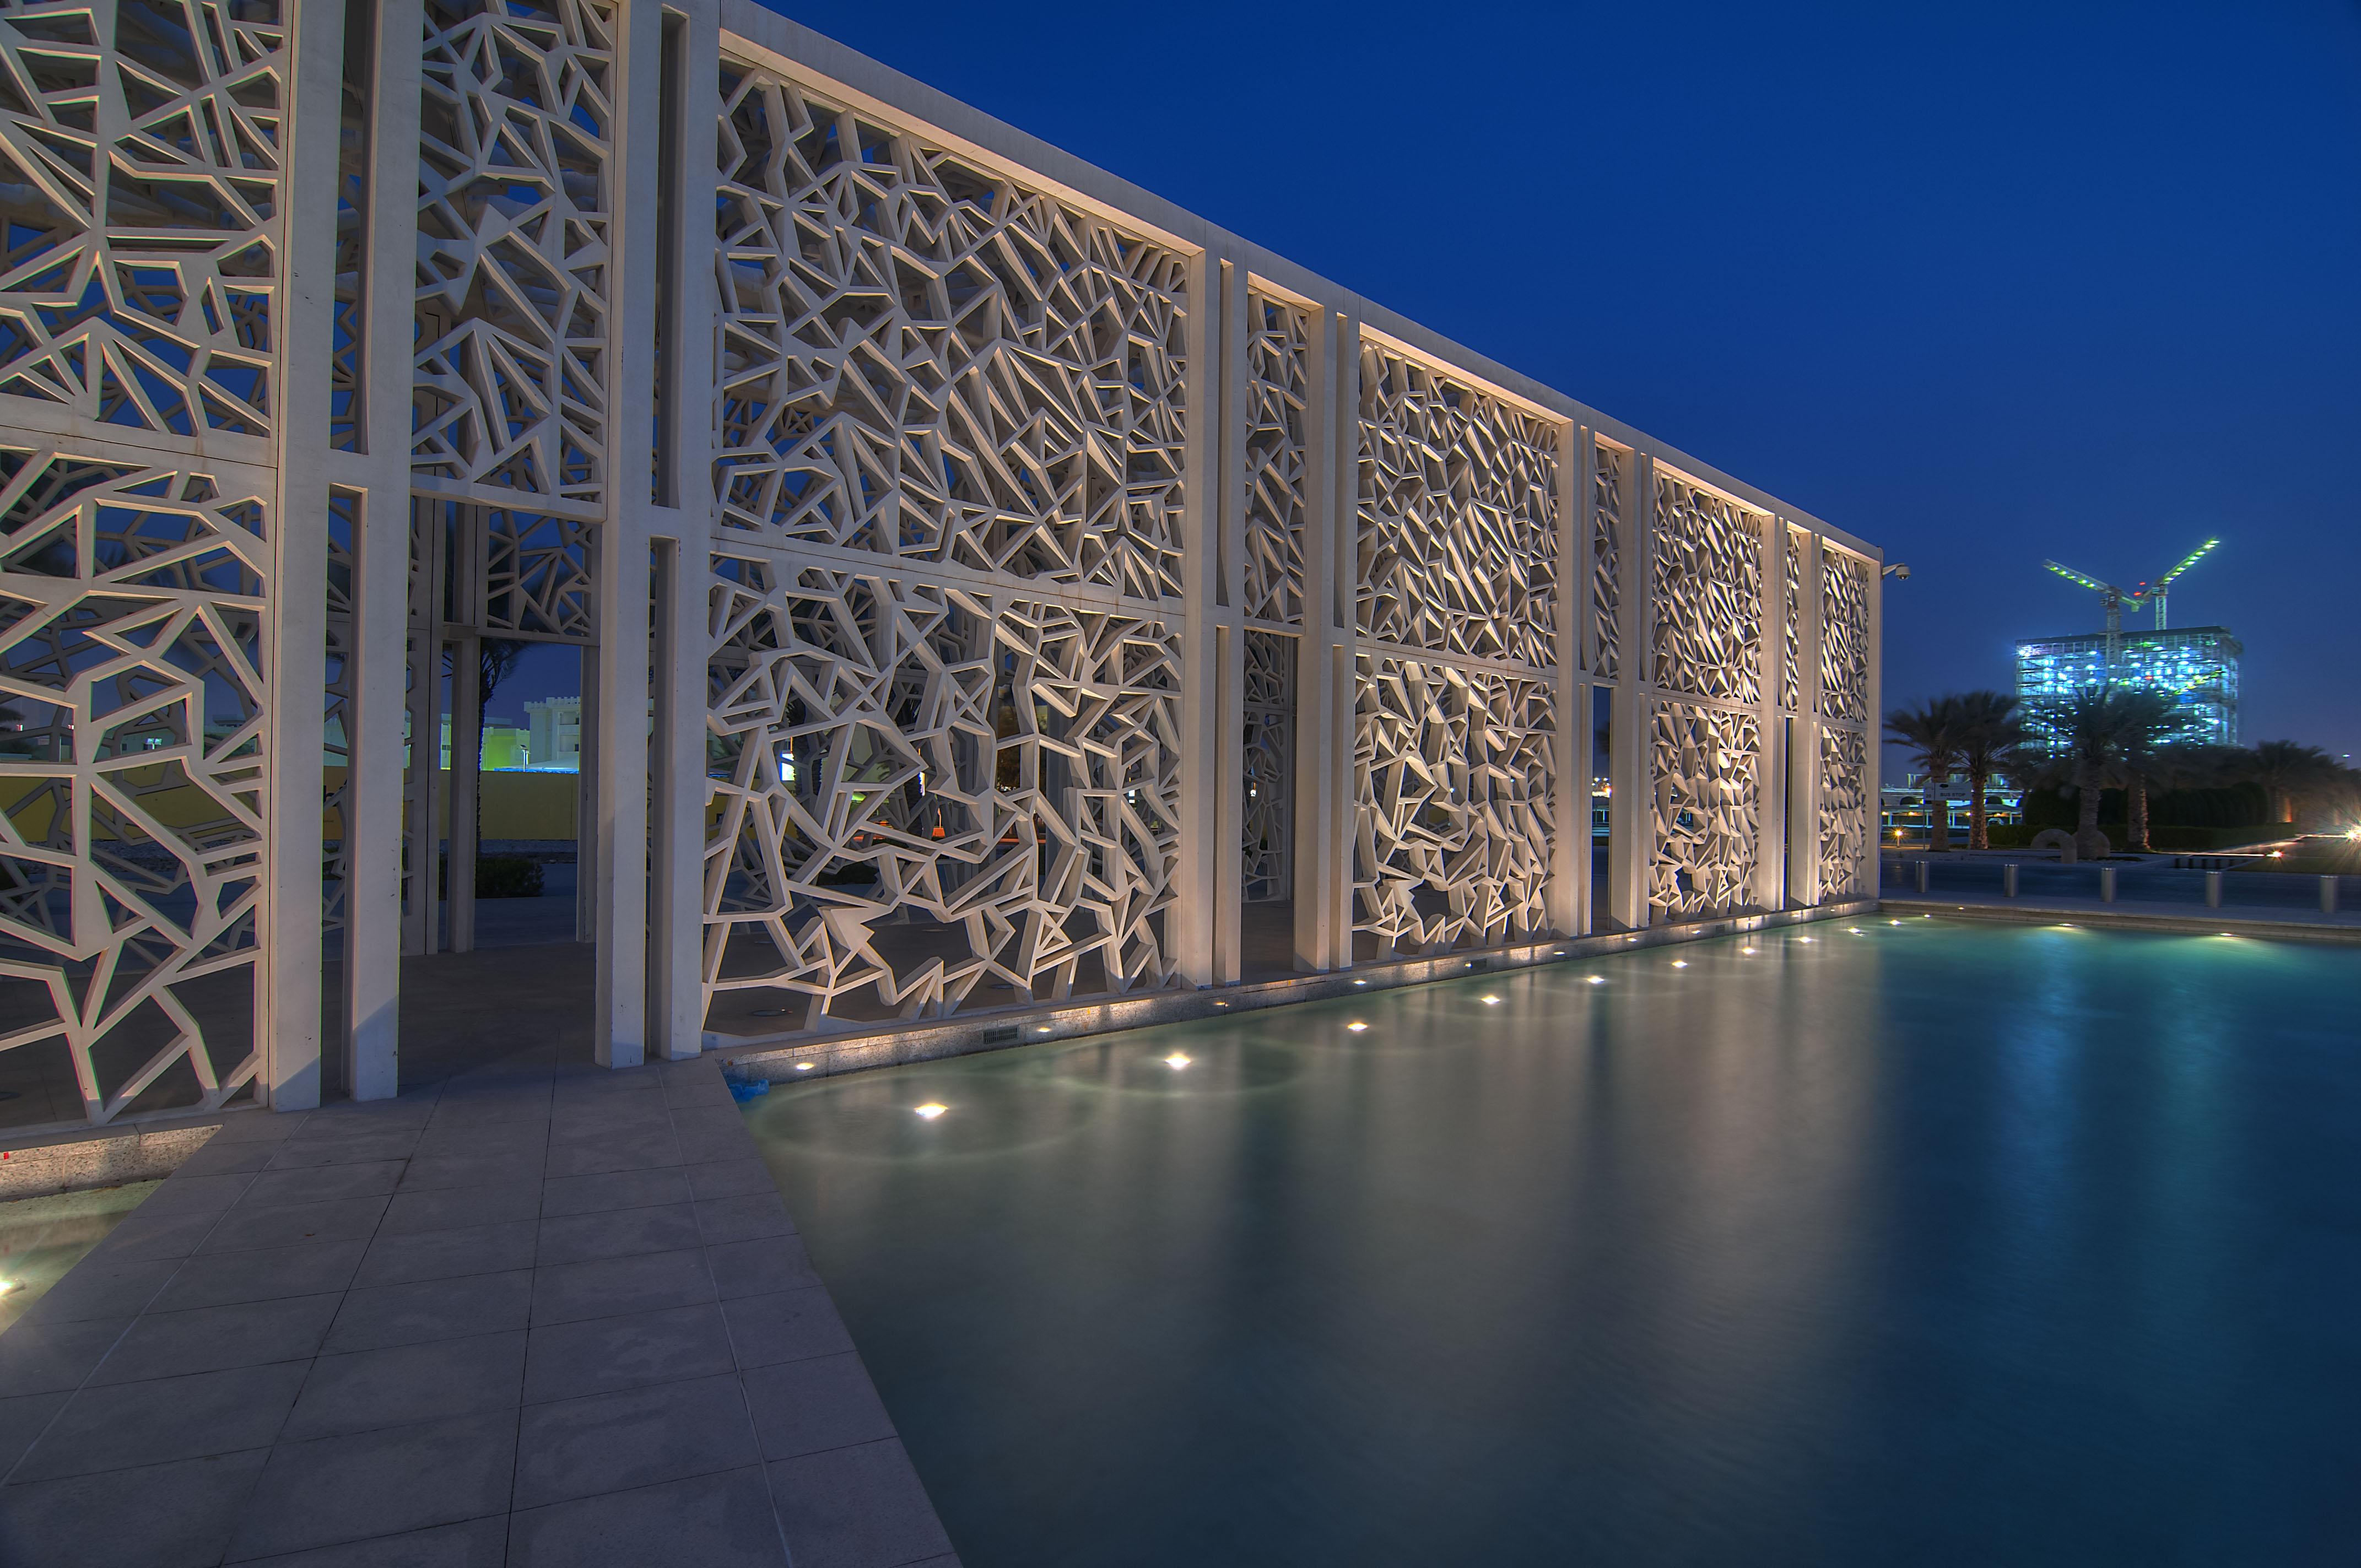 doha_qatar_march-passageway_ceremonial_court_education_city